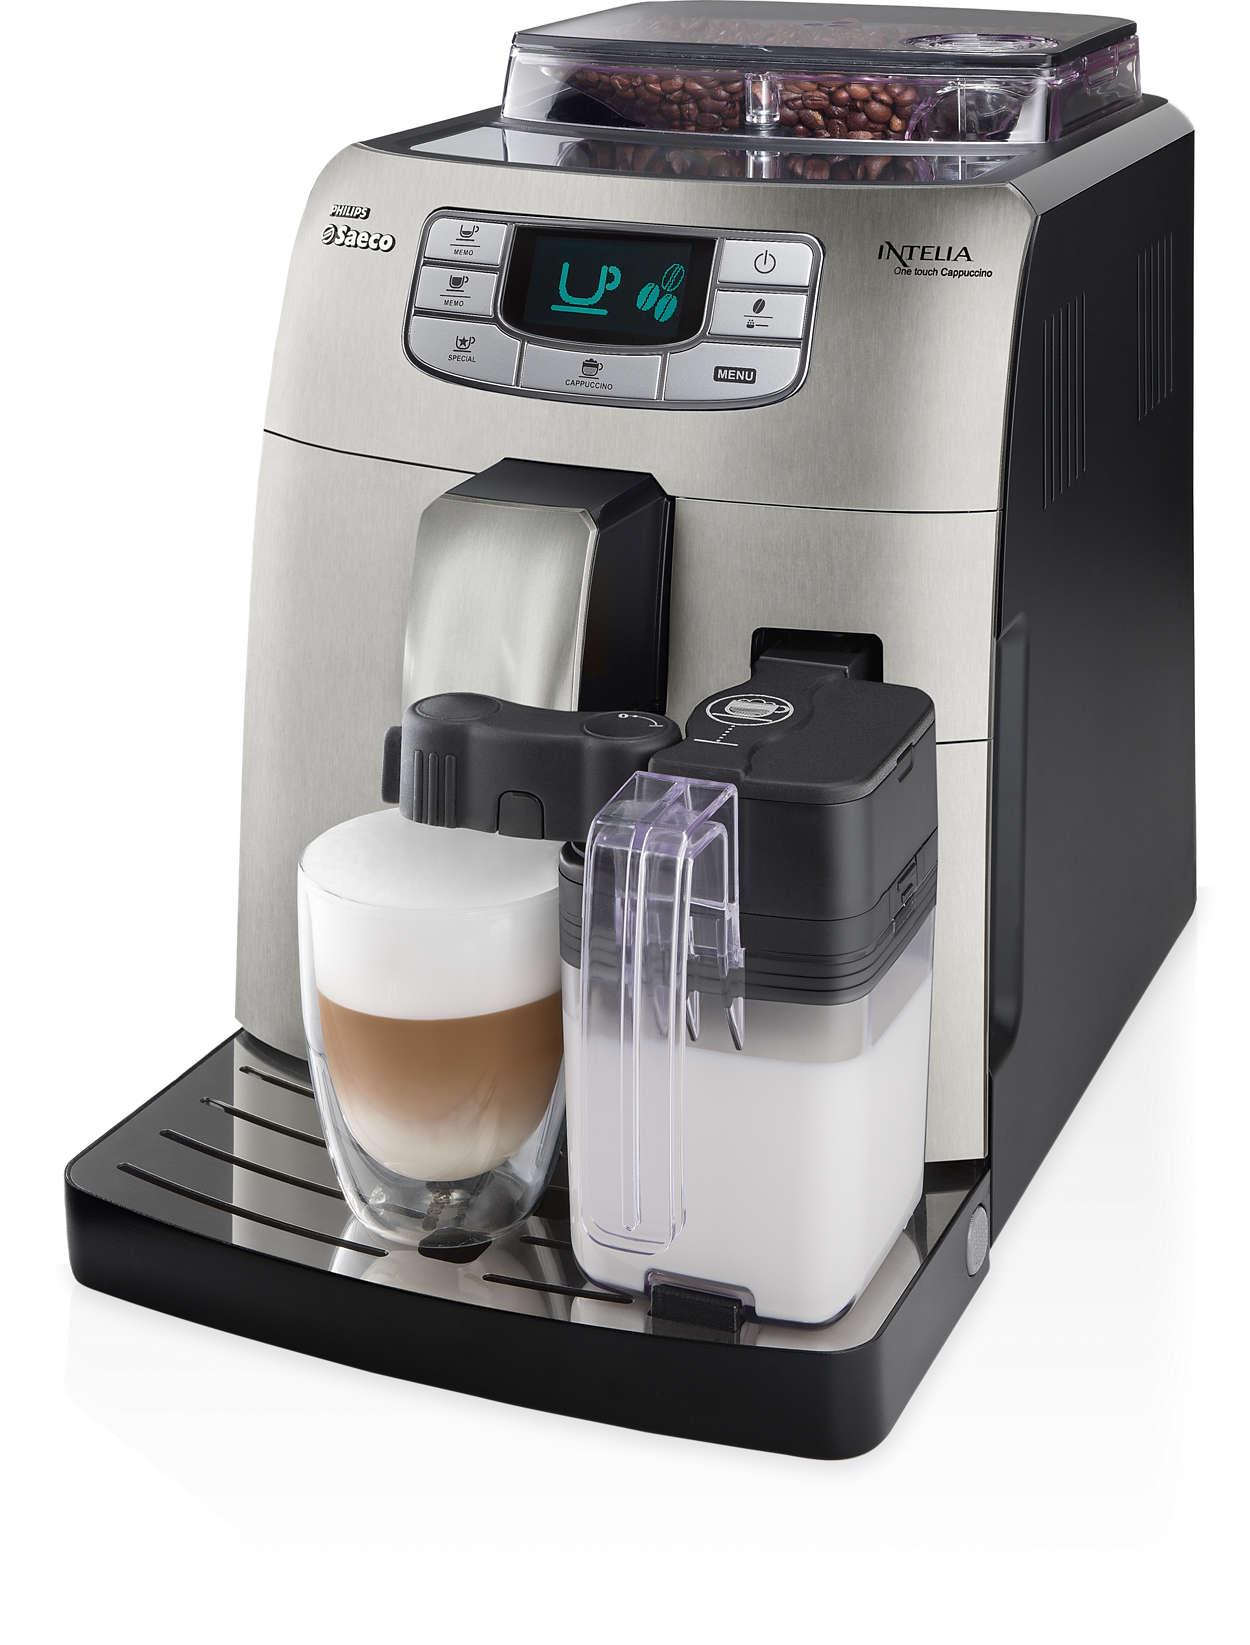 intelia kaffeevollautomat hd8753 83 saeco. Black Bedroom Furniture Sets. Home Design Ideas